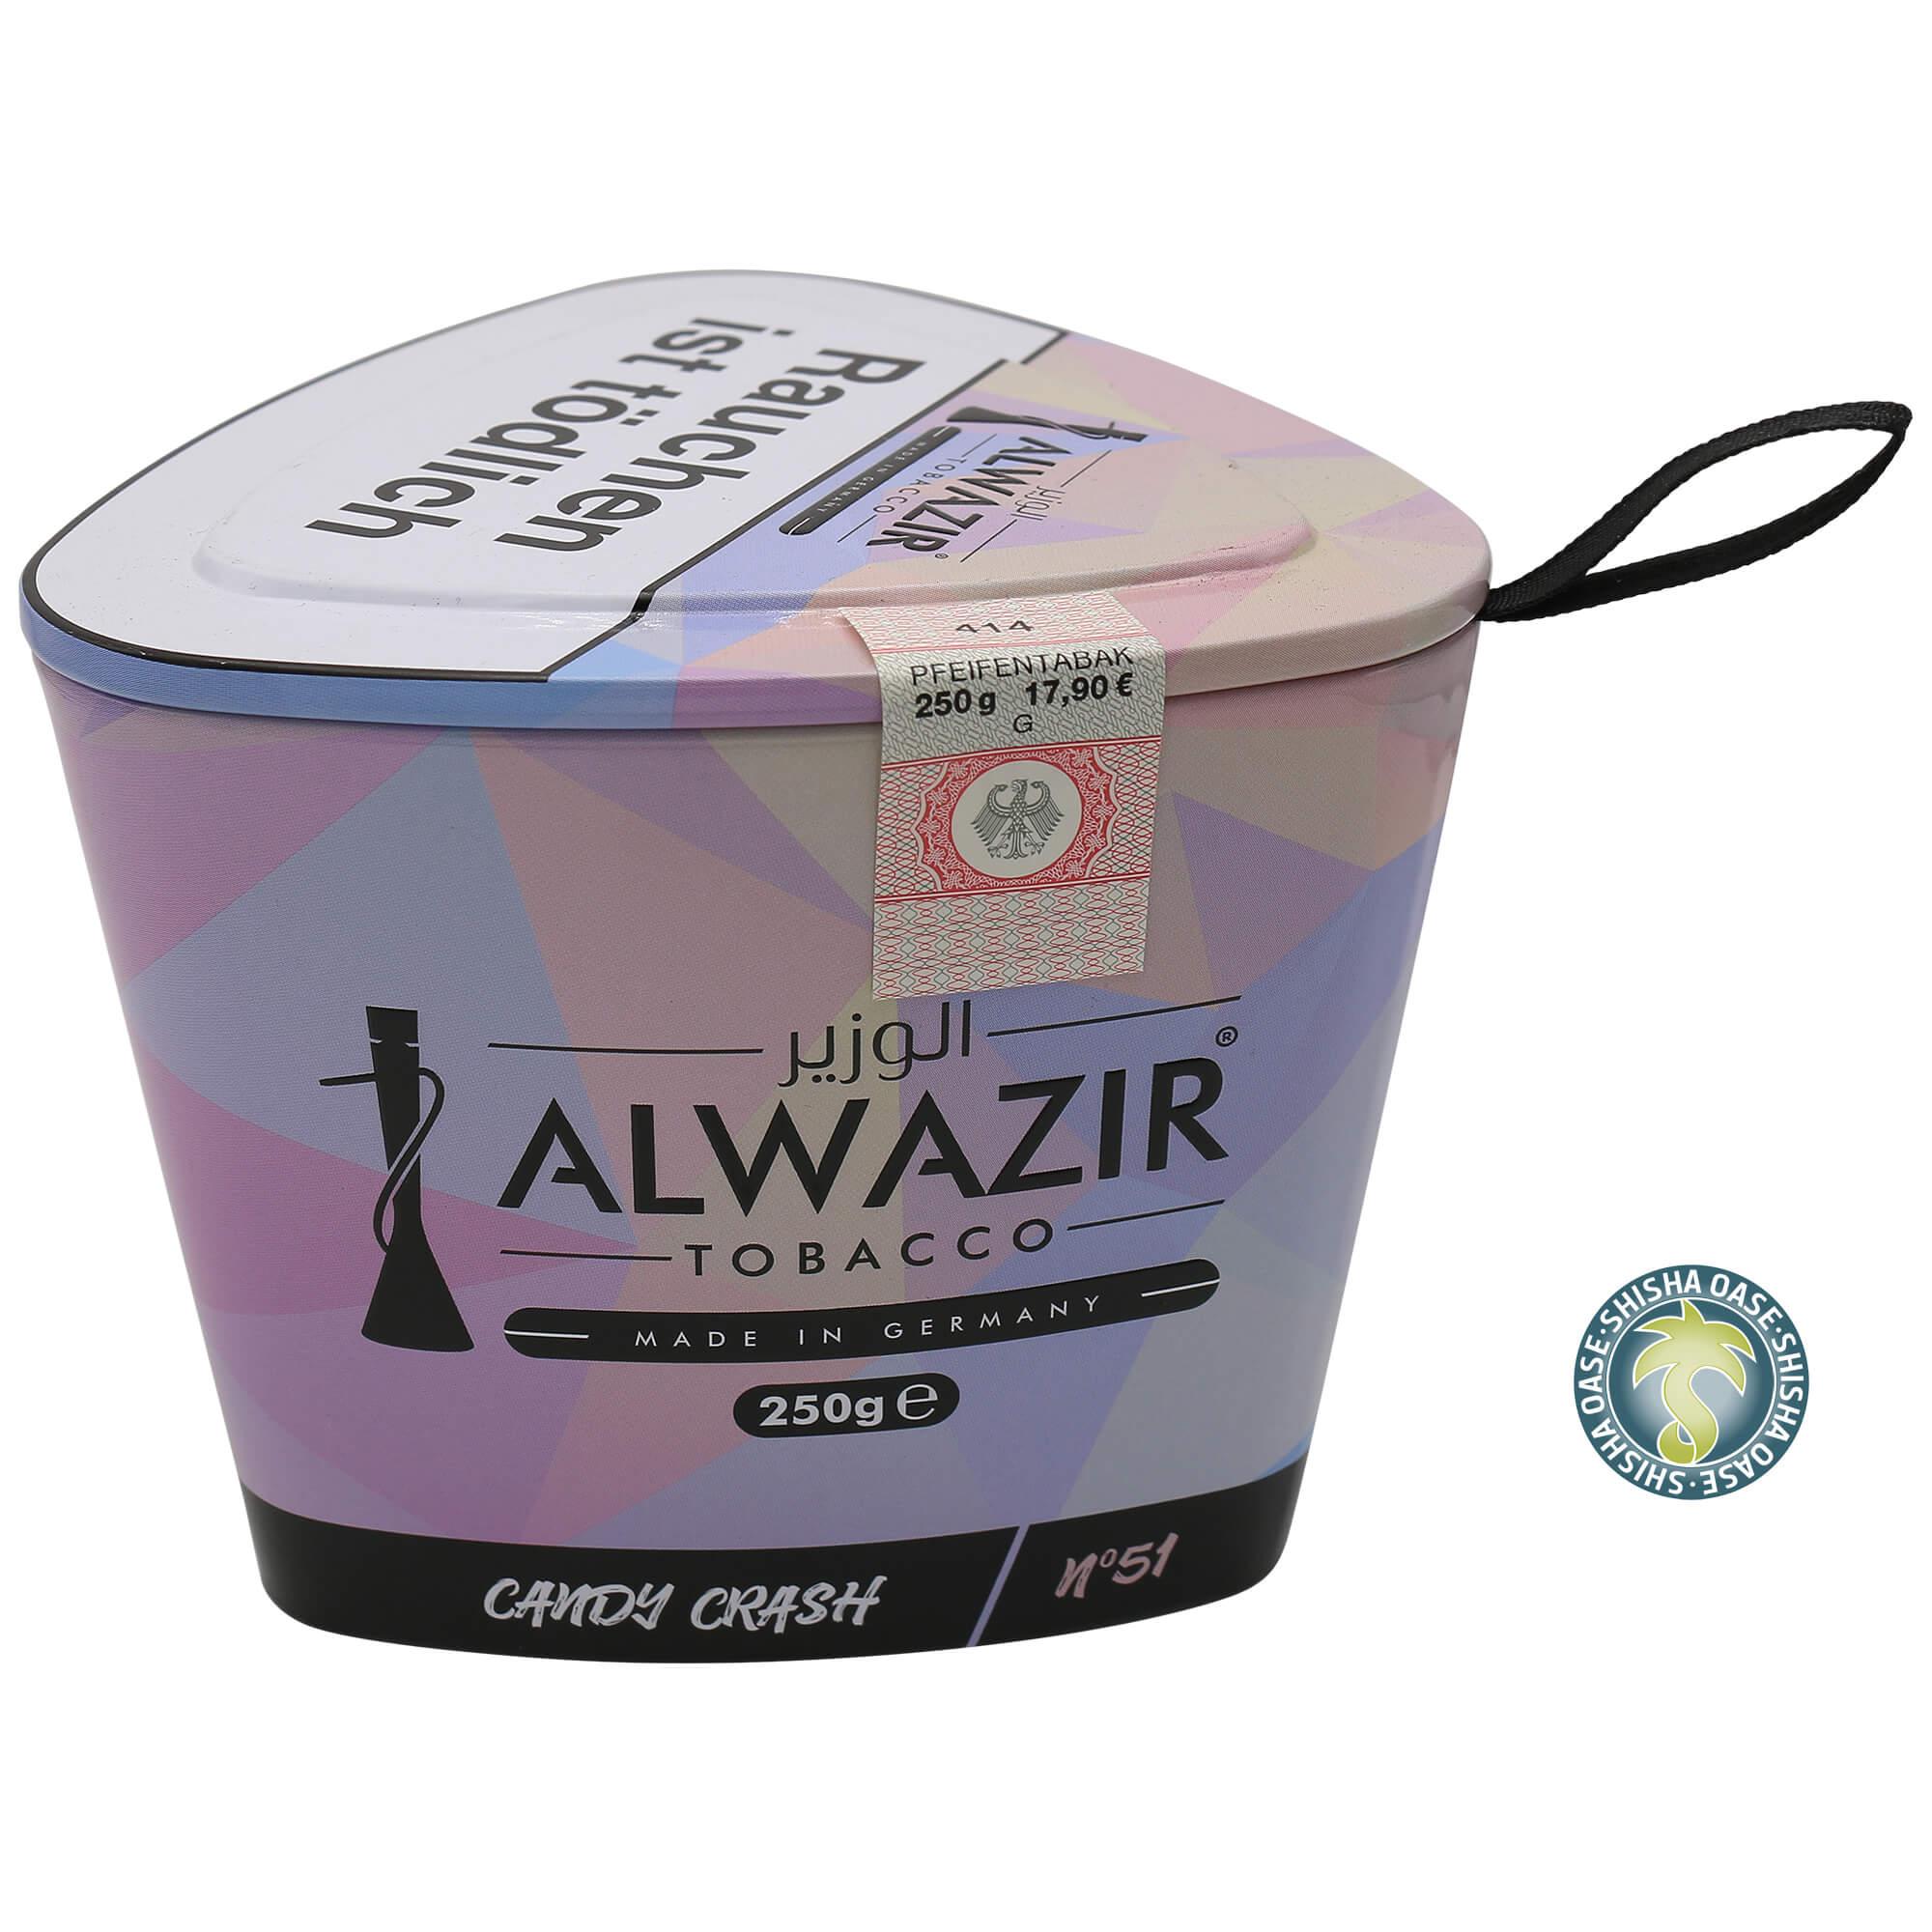 Al Wazir Tabak 250g Dose - Candy Crash No.51